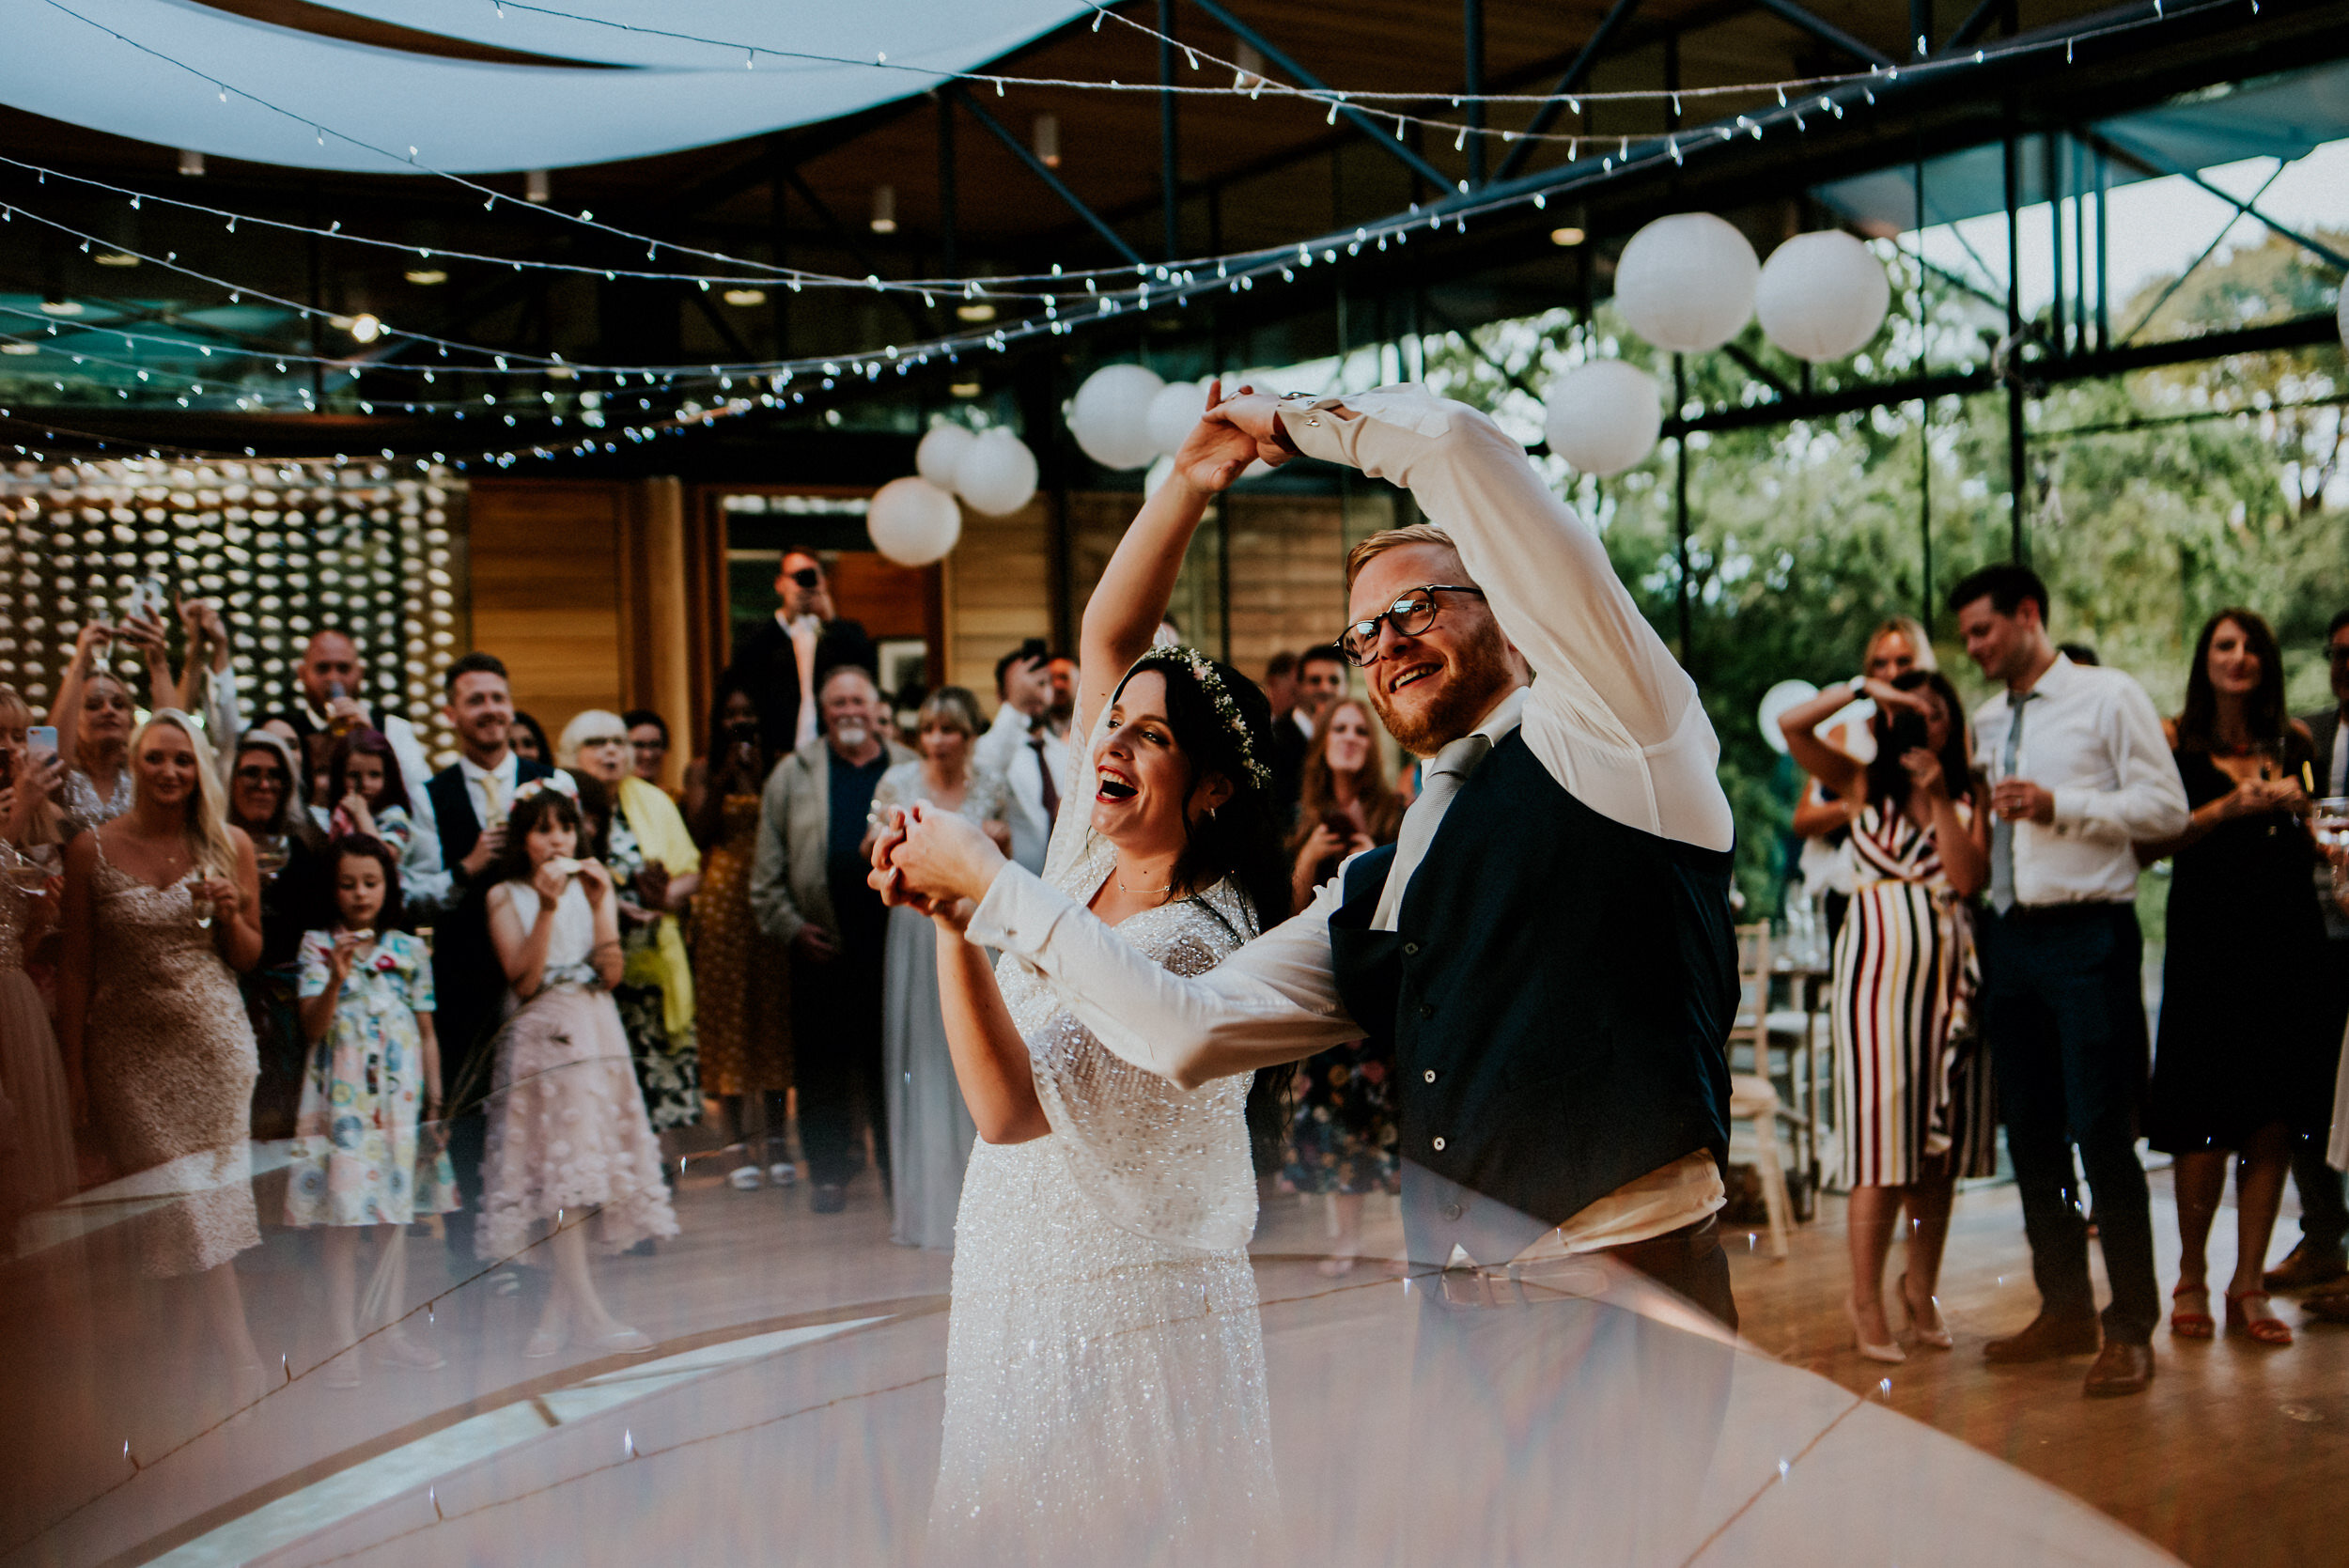 utopia-broughton-hall-skipton-wedding-photography-shutter-go-click-98.jpg